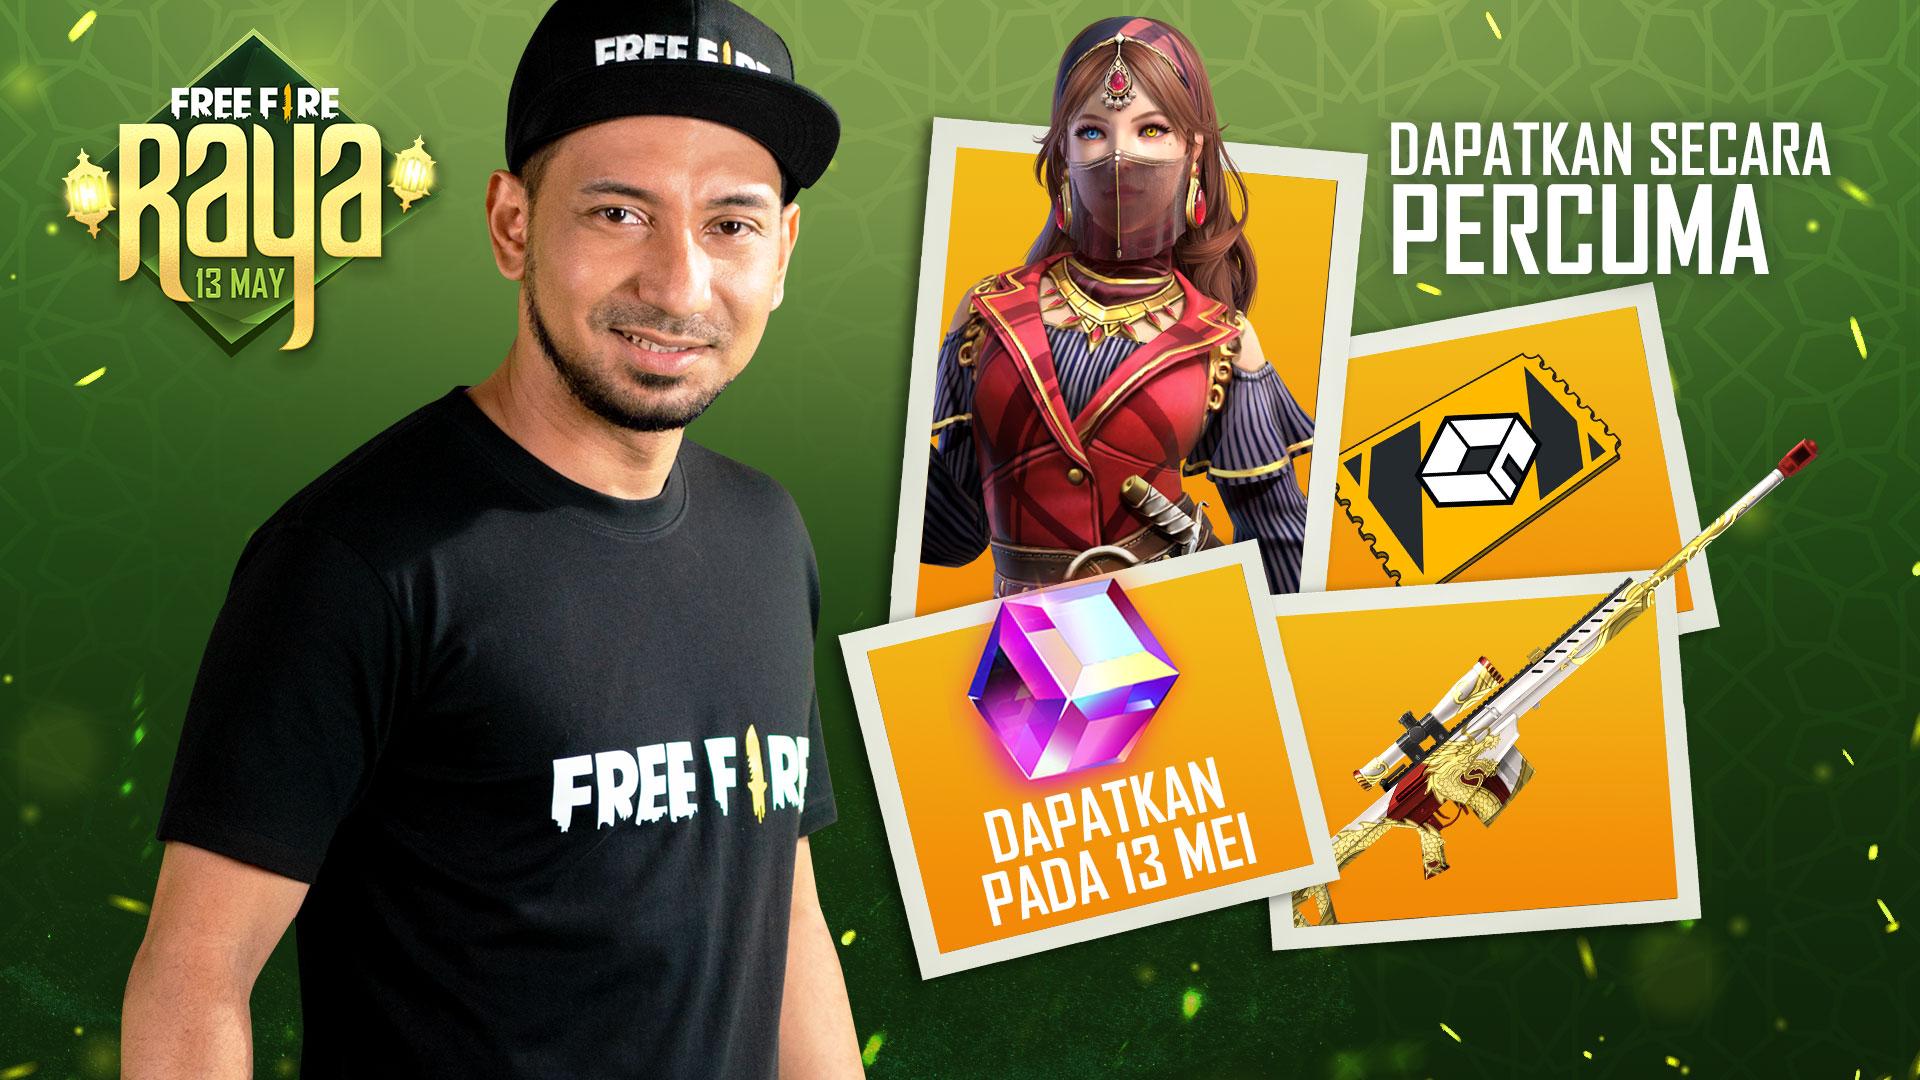 Zizan Razak jadi duta Free Fire Malaysia